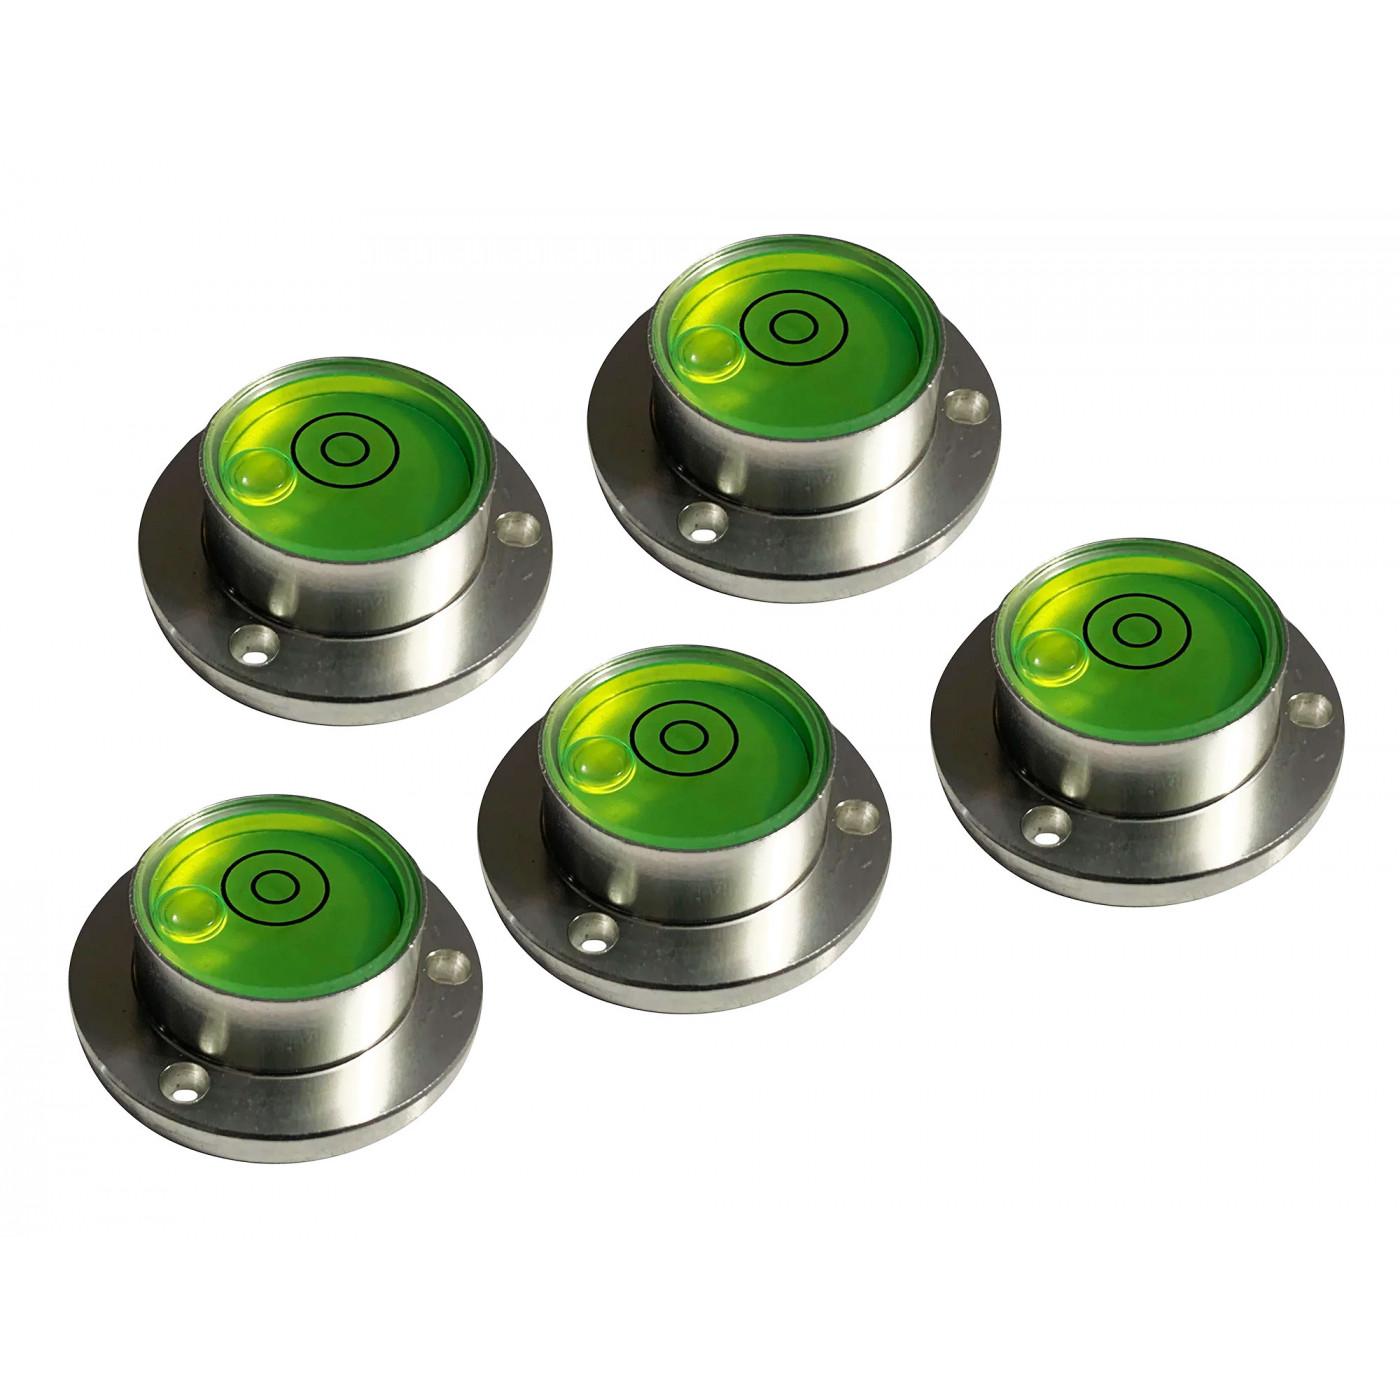 Set van 5 ronde waterpassen in aluminium behuizing (30x20x11